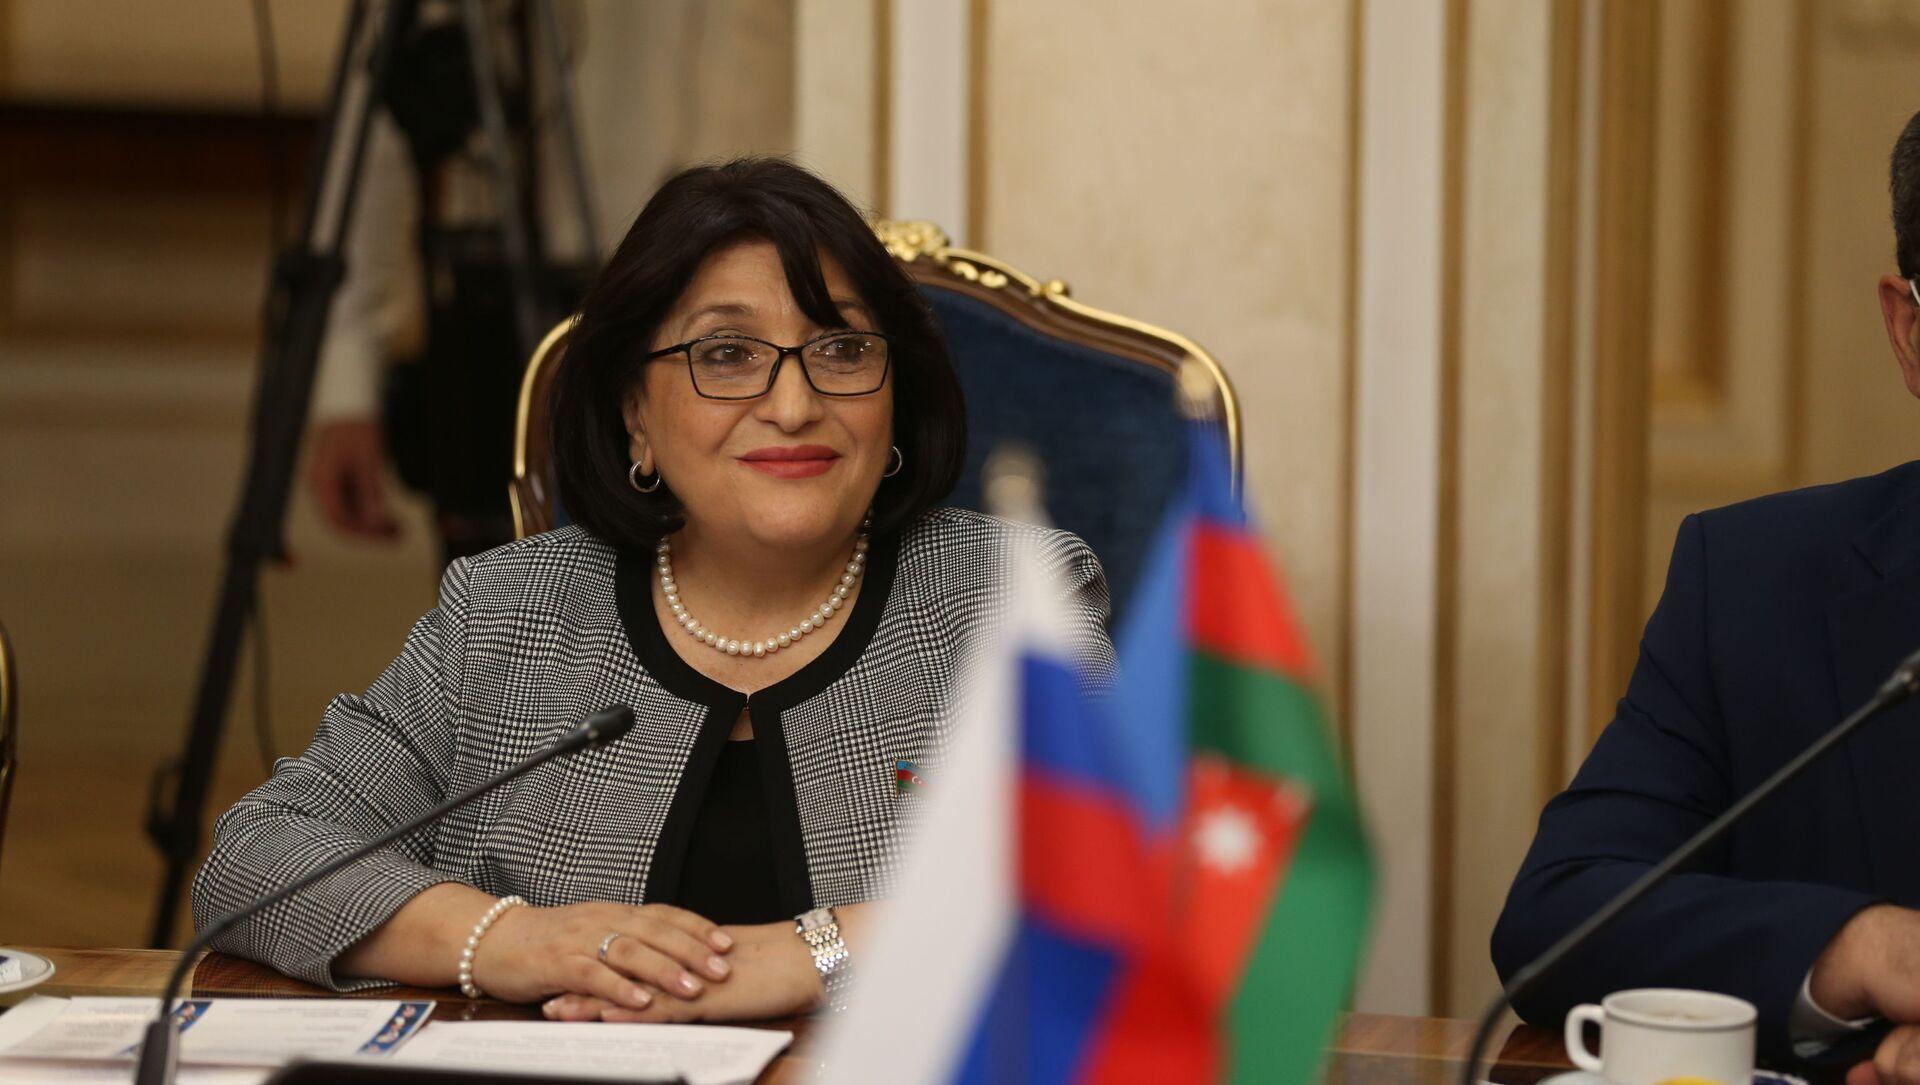 Председатель Милли Меджлиса АР Сахиба Гафарова - Sputnik Азербайджан, 1920, 16.04.2021